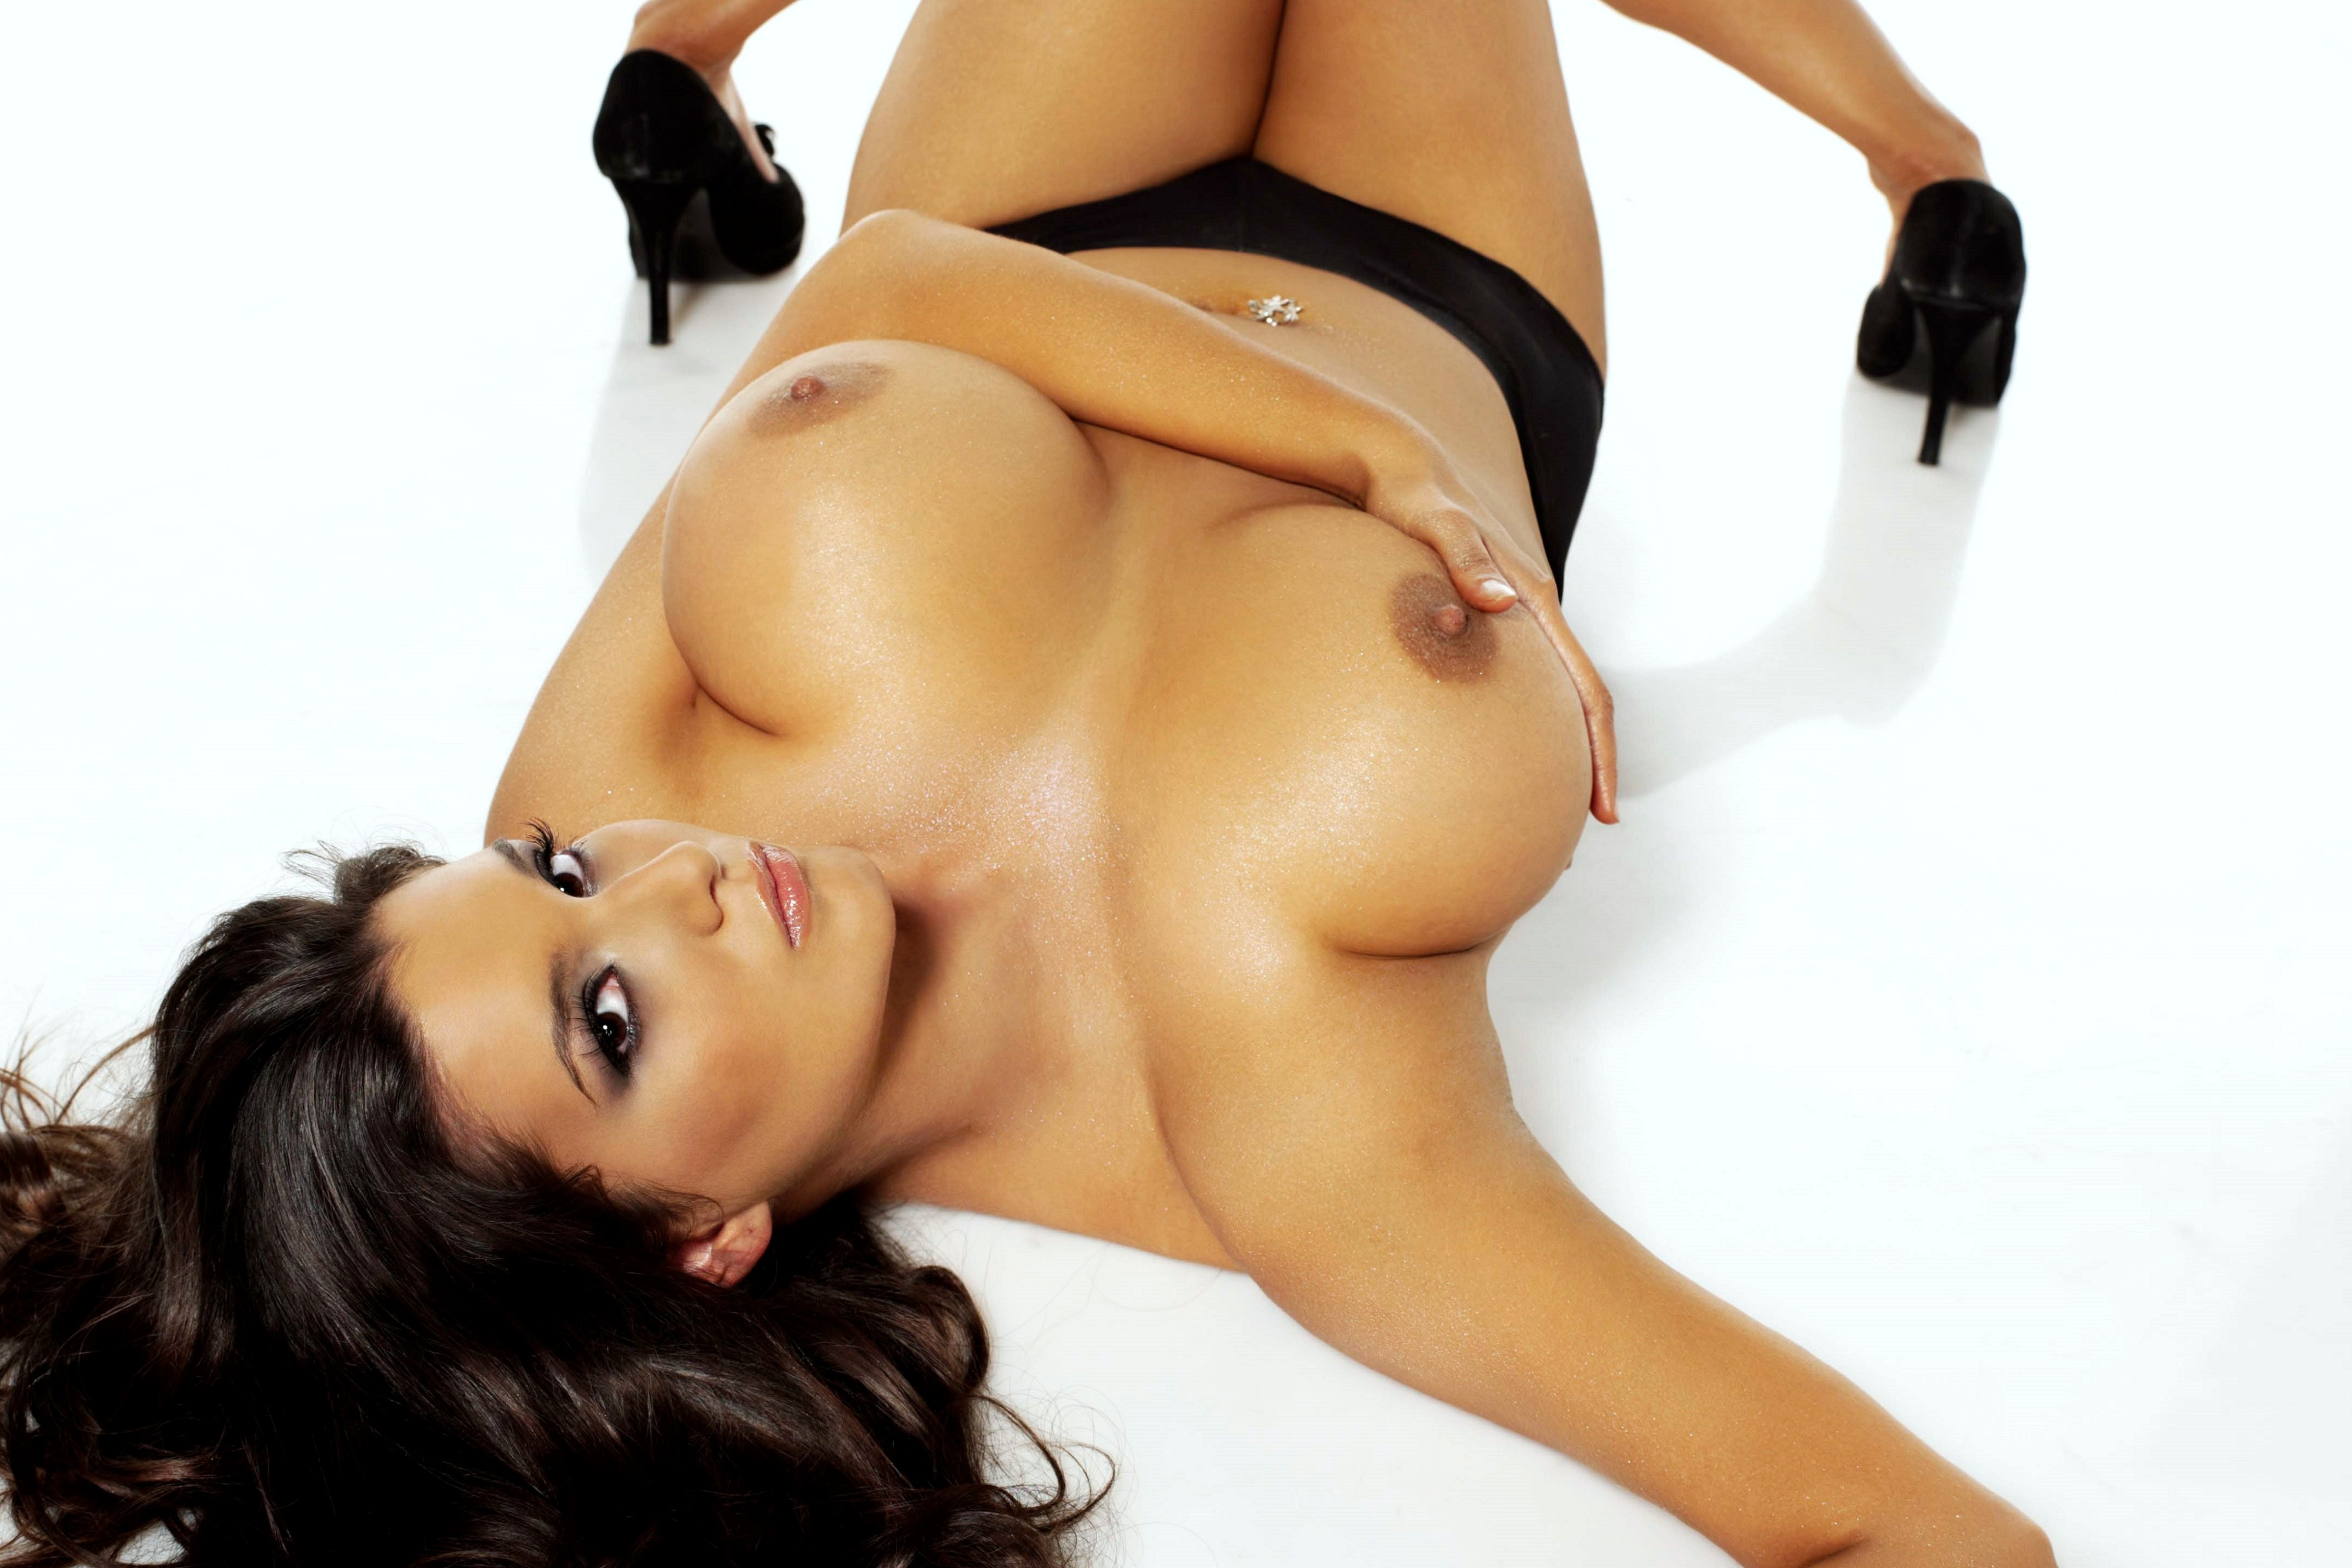 Googlesexy naked curvy women